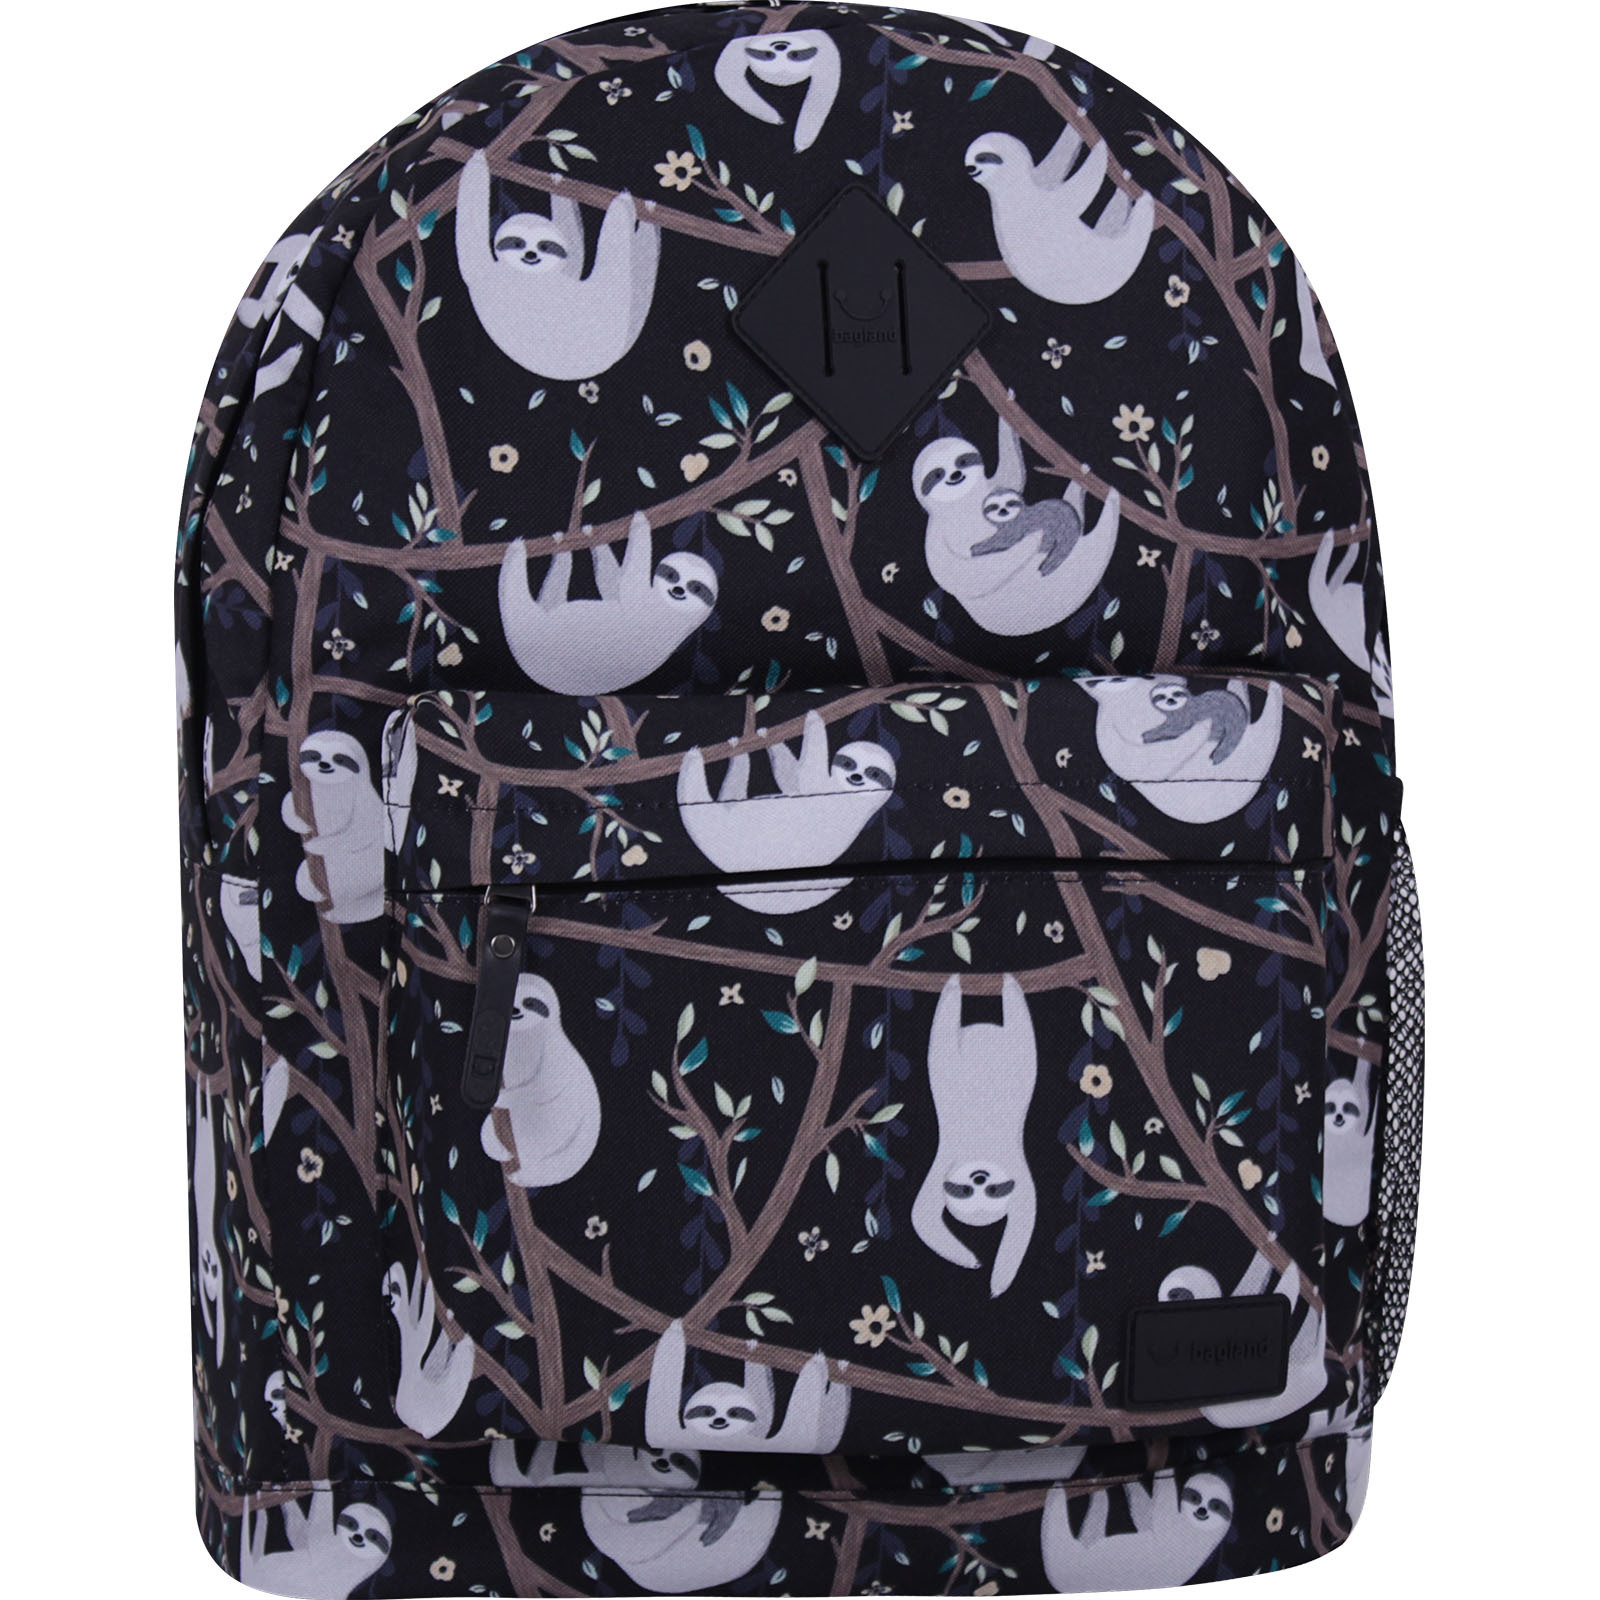 Городские рюкзаки Рюкзак Bagland Молодежный 17 л. сублімація 760 (00533664) IMG_7598_суб760_-1600.jpg